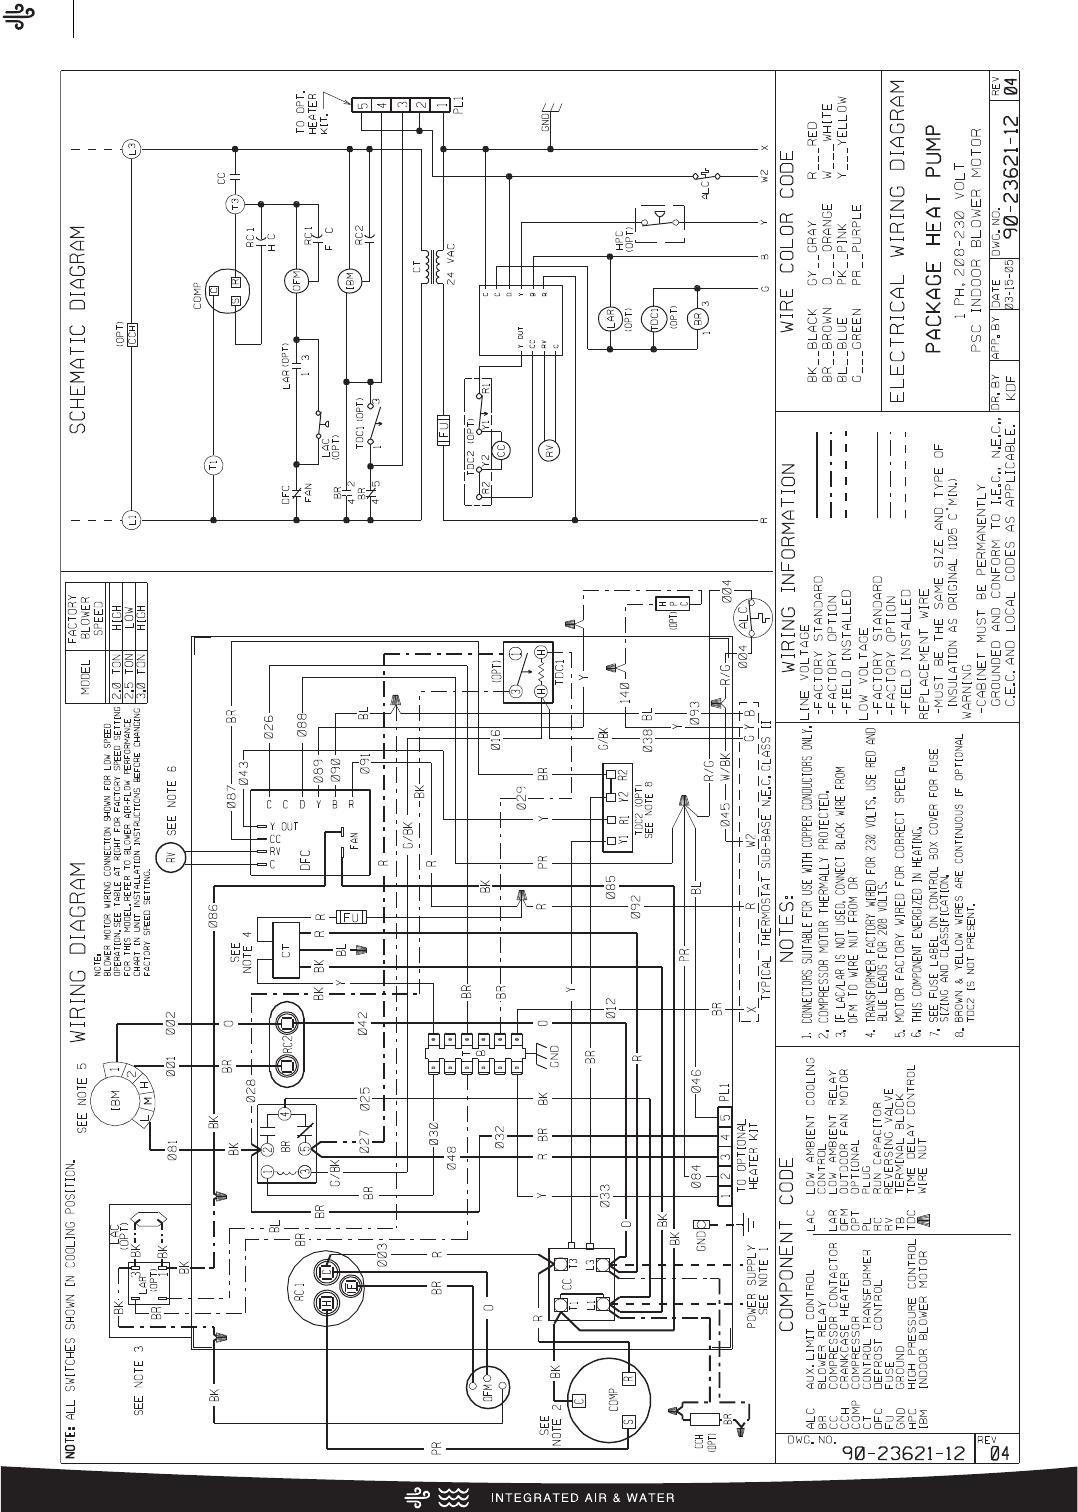 Rheem Classic Series Package Heat Pump Specification Sheet